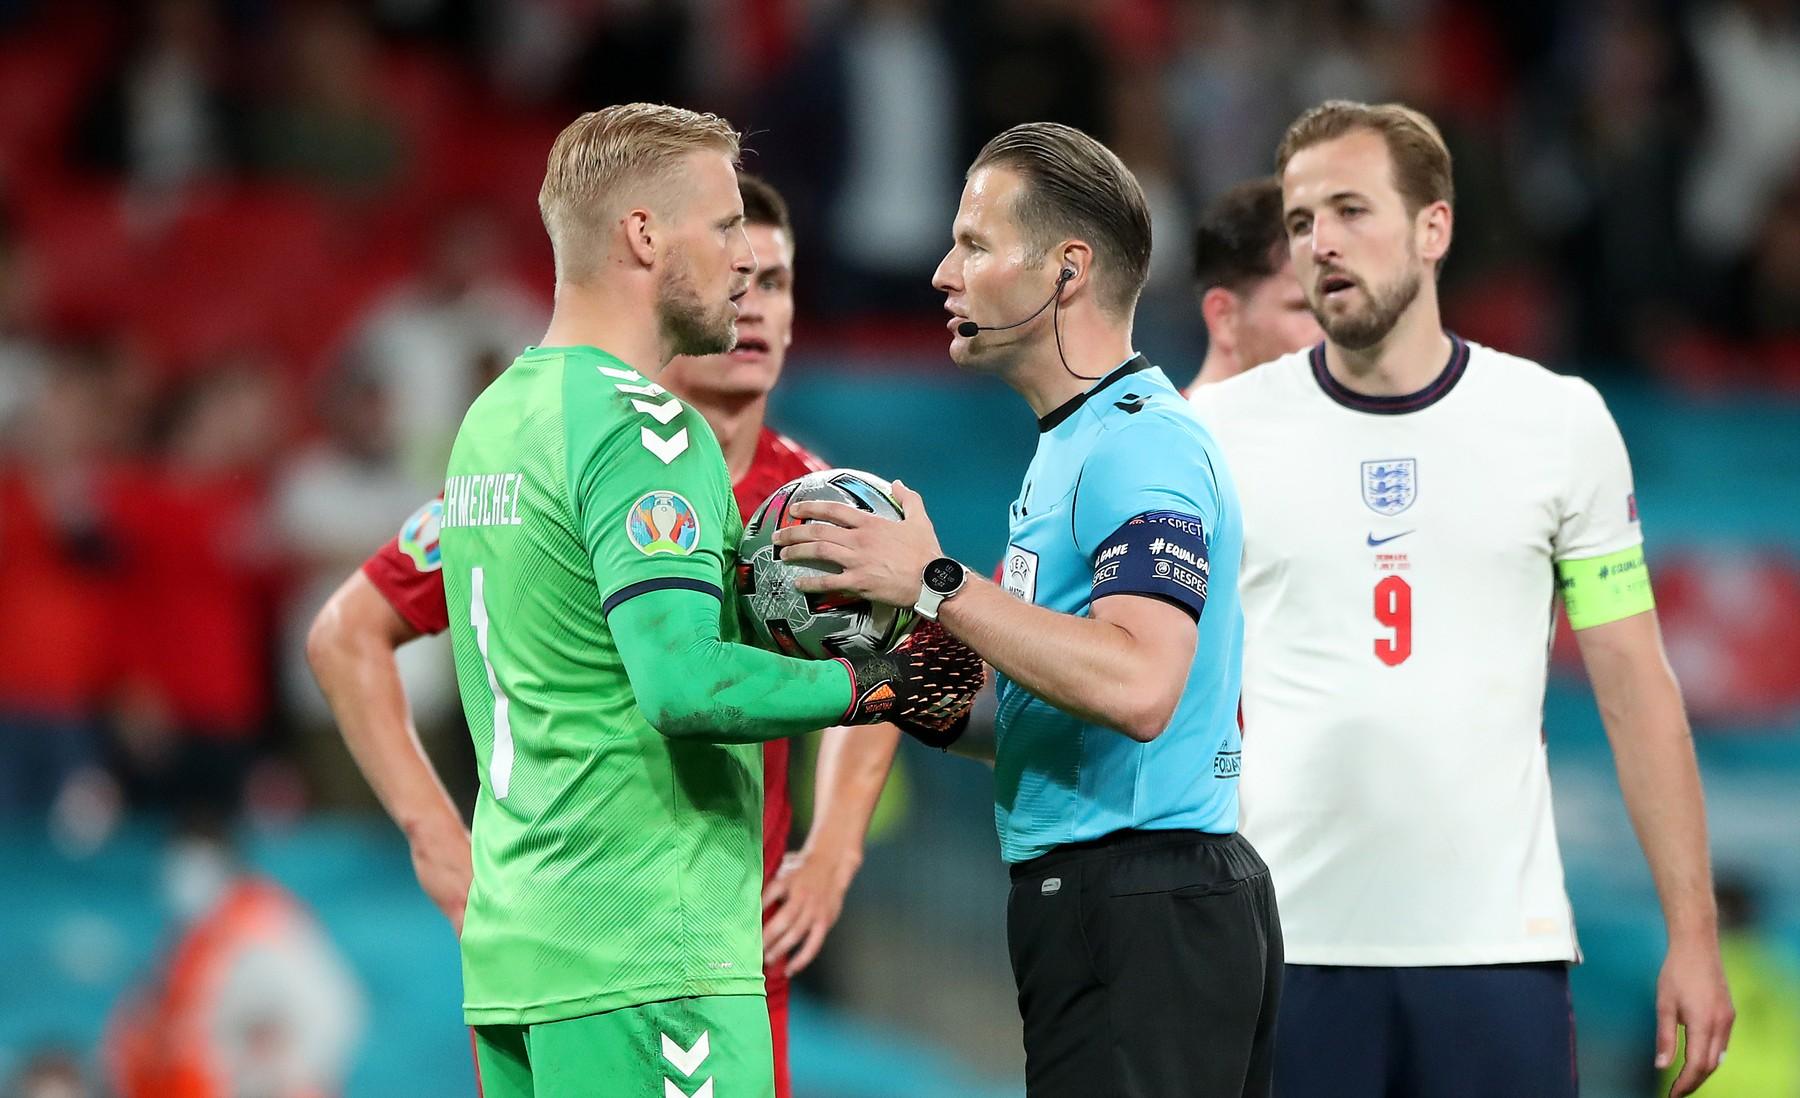 EURO 2020, Profimedia Images